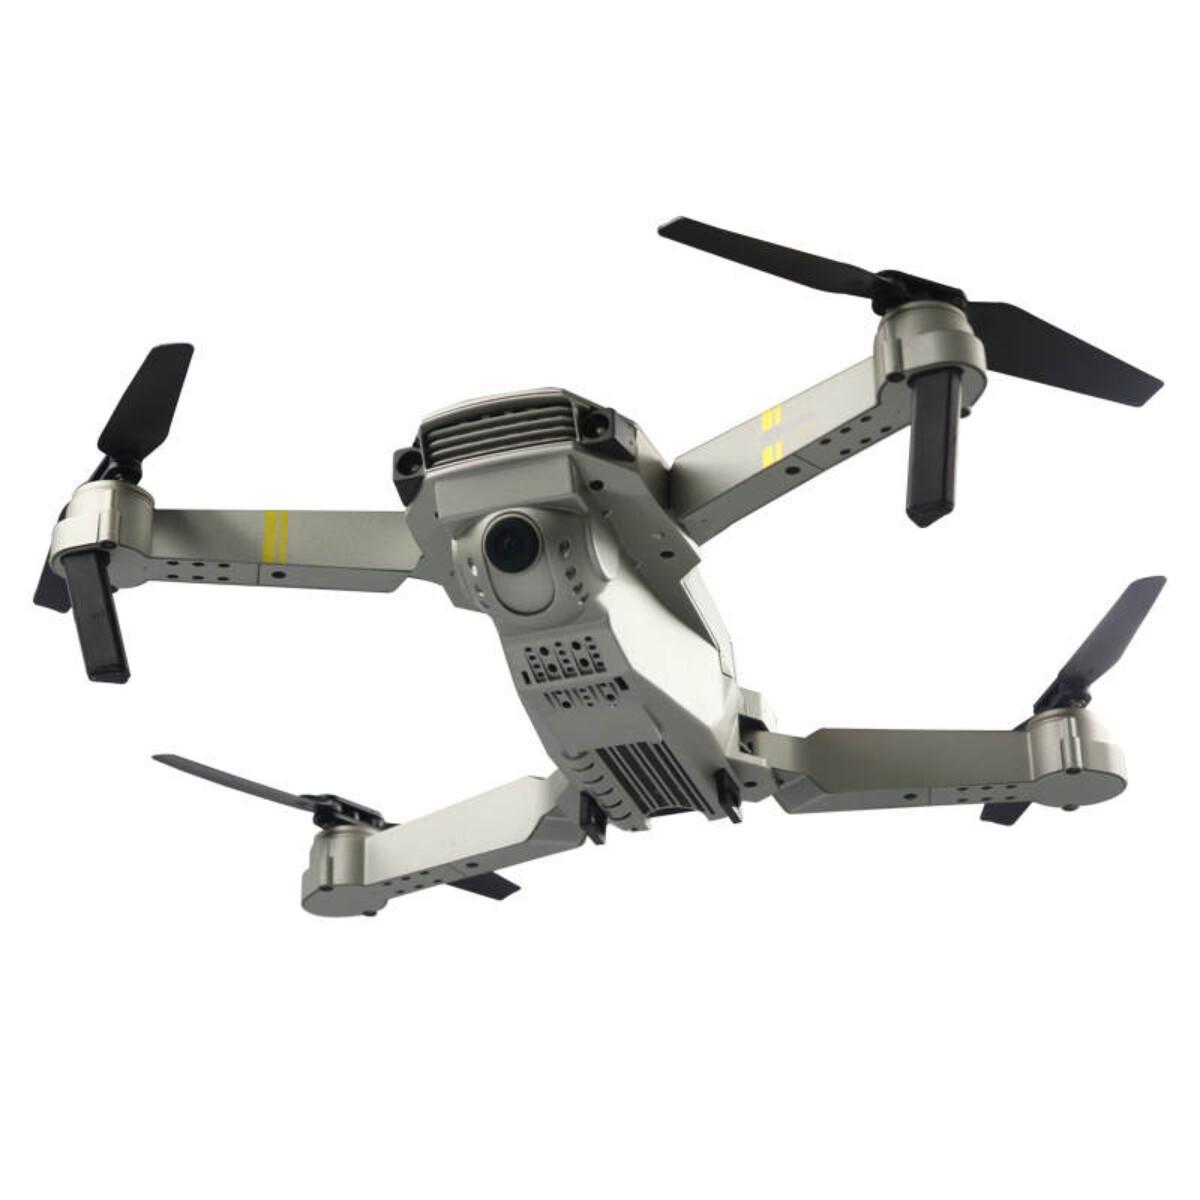 Drone Med Kamera - Flere Farger